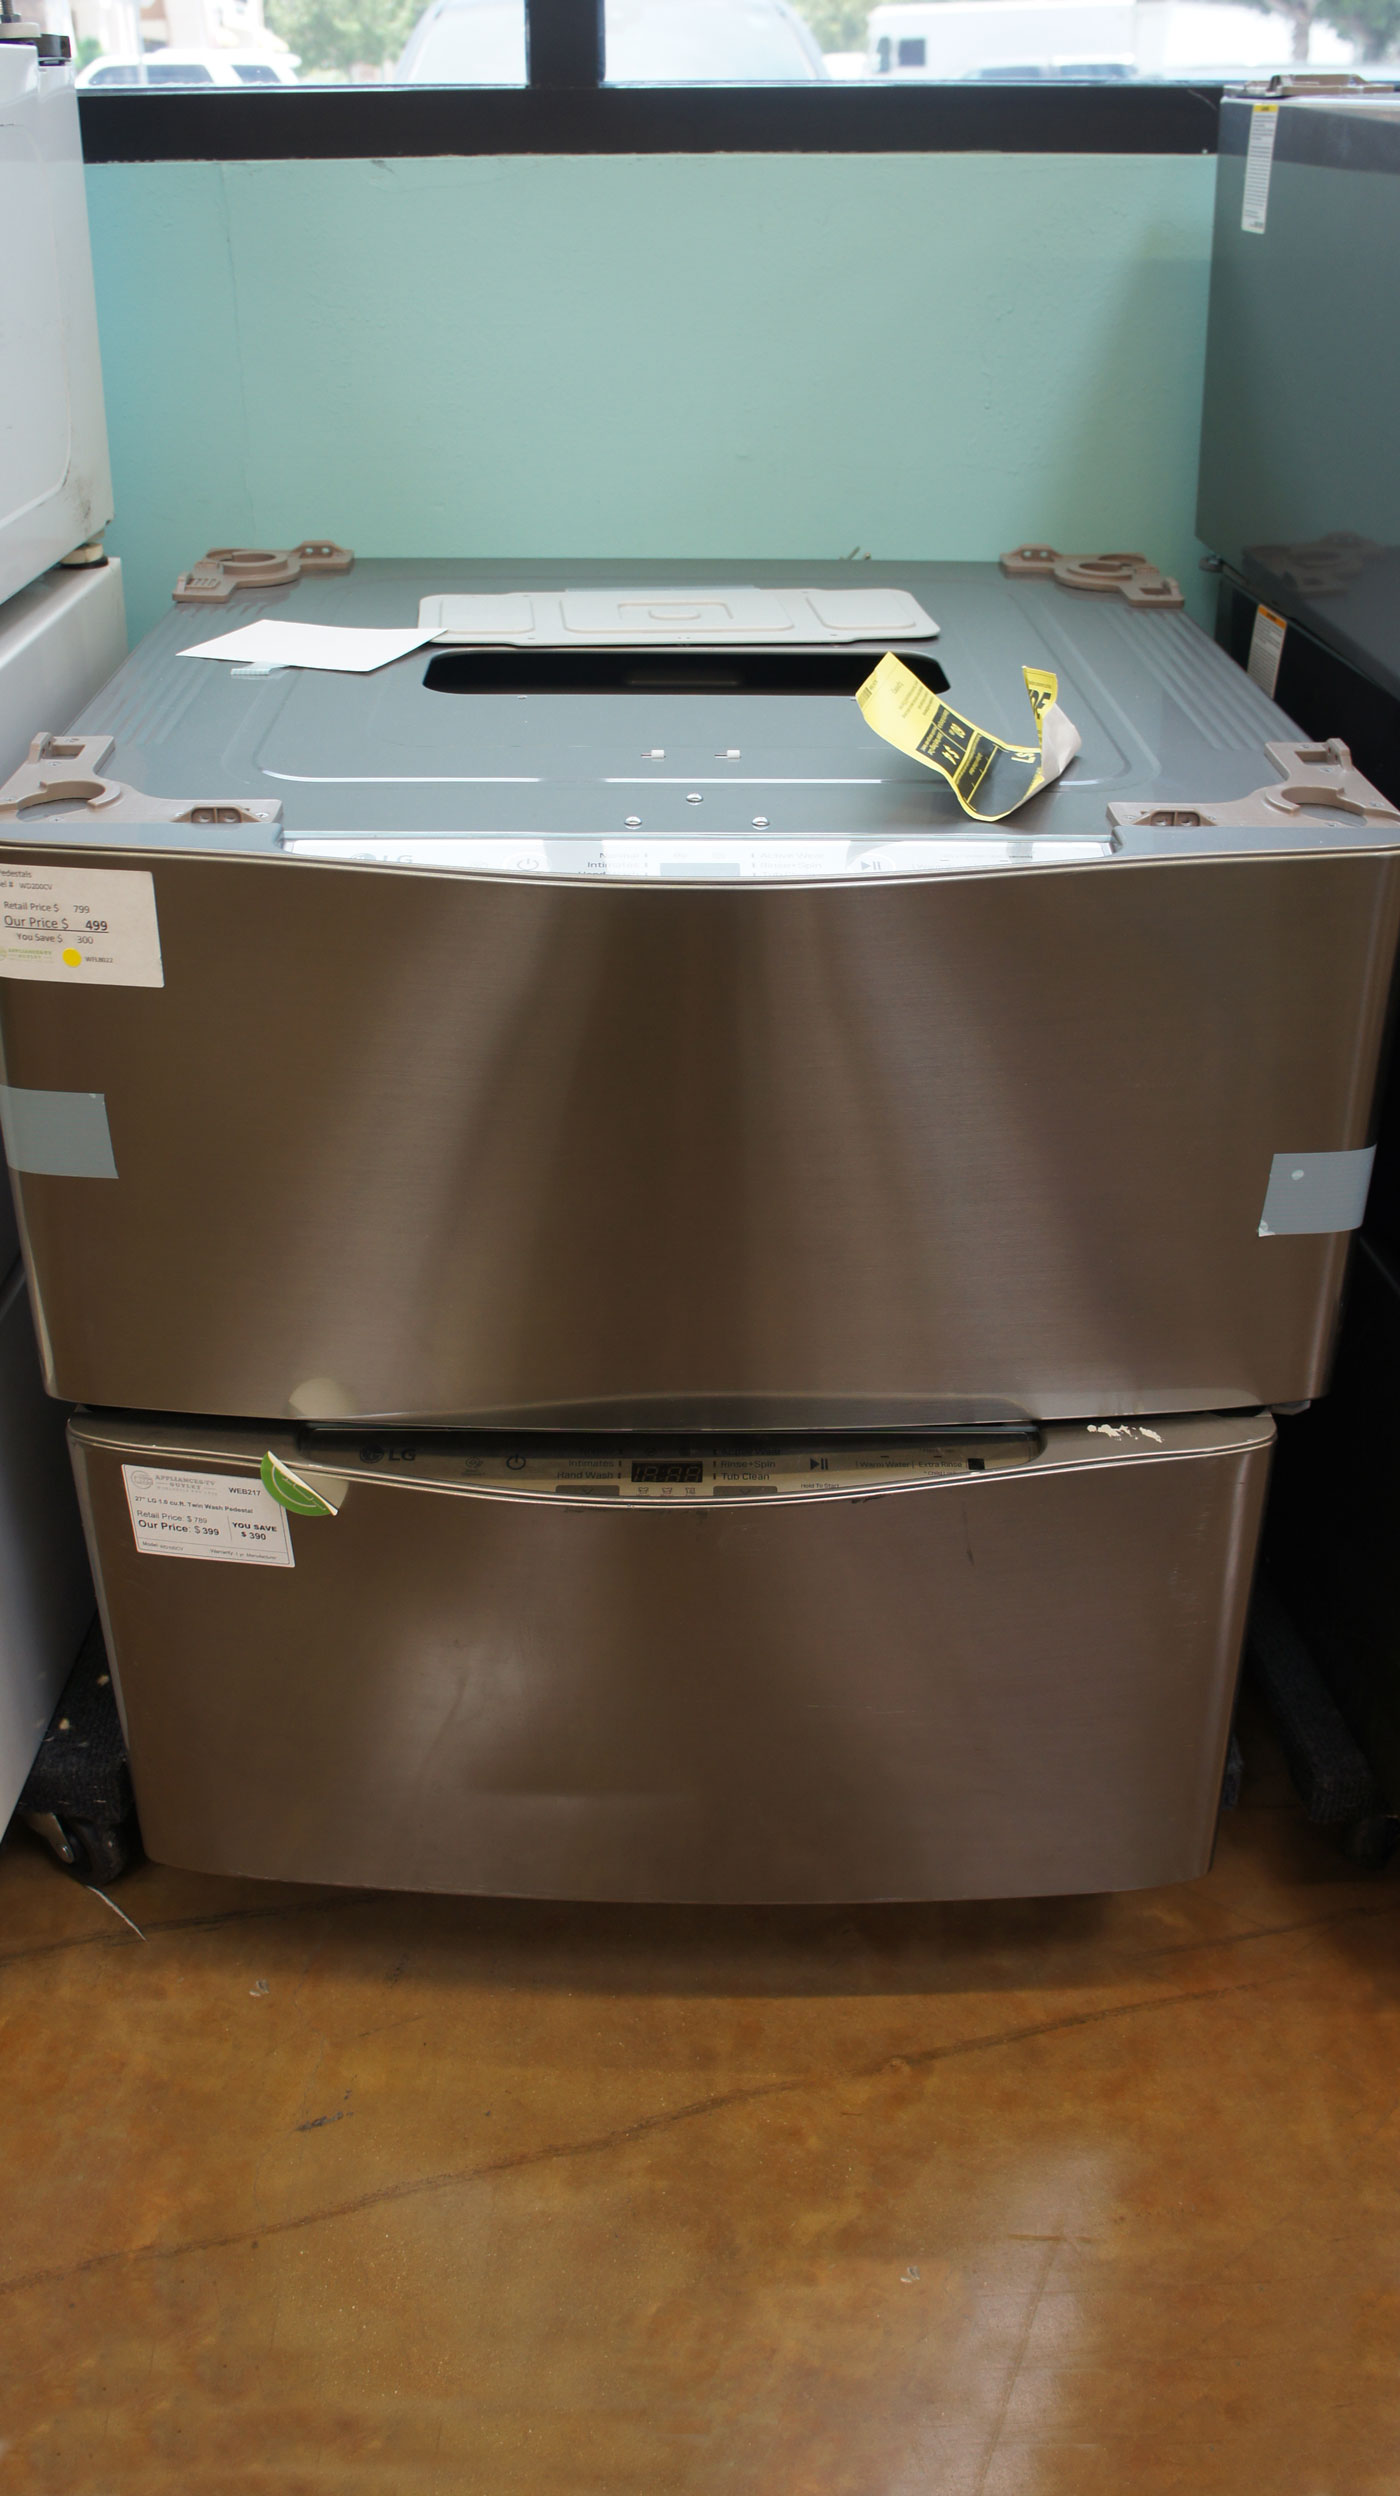 LG SideKick Washer Pedestal